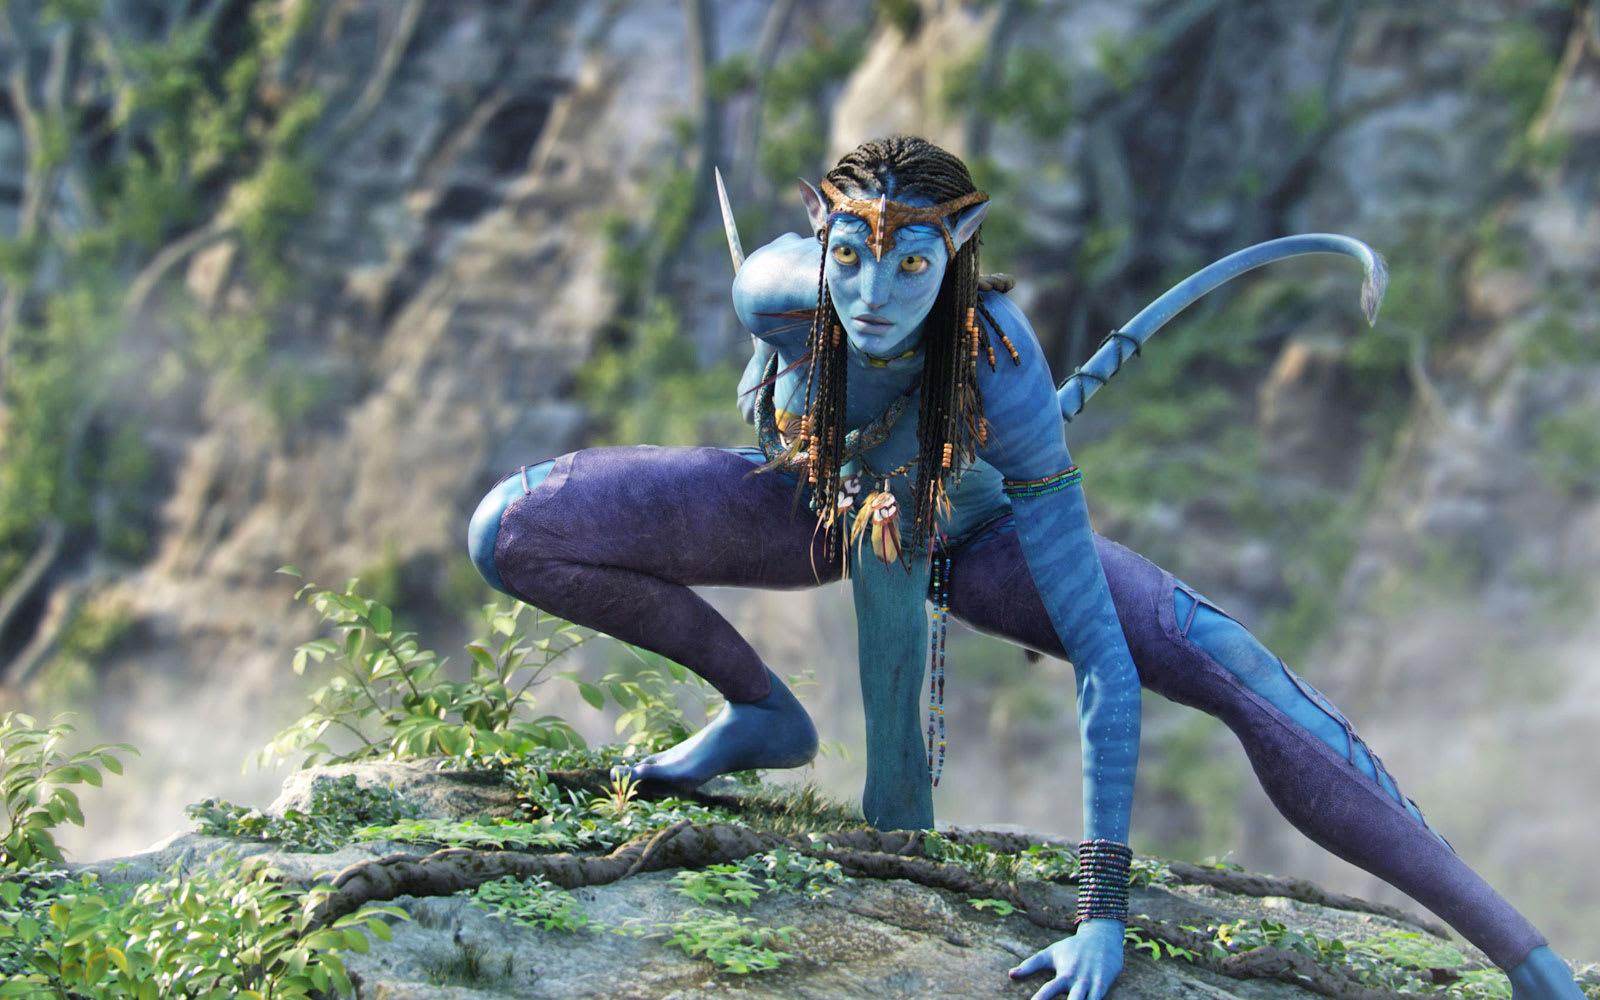 Avatar Tour Dates 2020 Avatar' sequels start arriving on December 18th, 2020